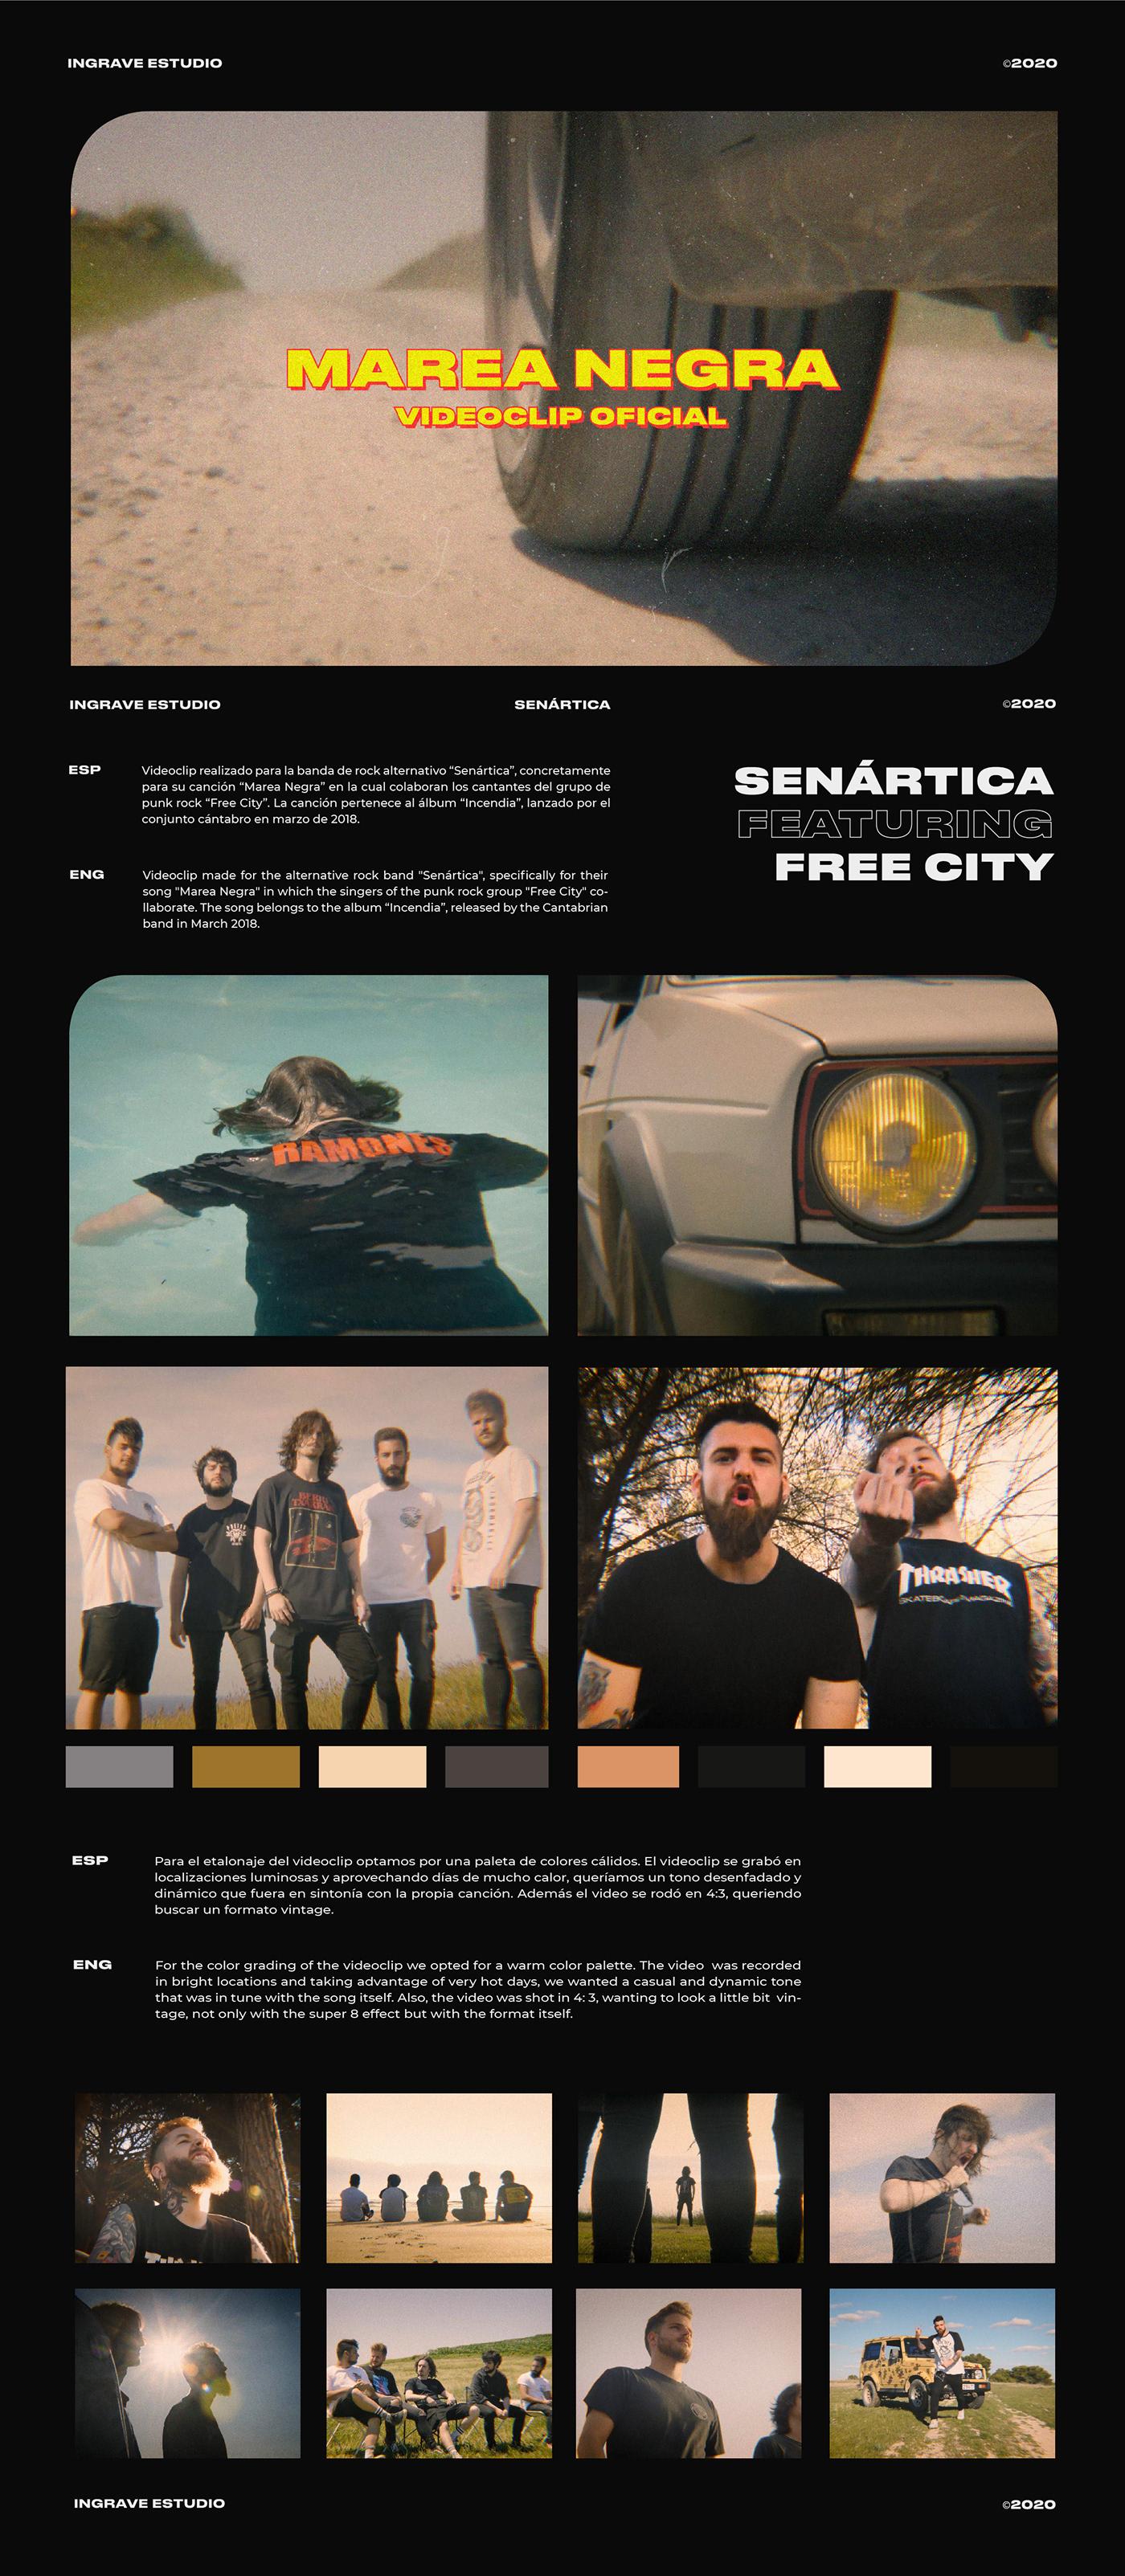 filmmaking free city Marea Negra music punk rock senártica super8 vintage